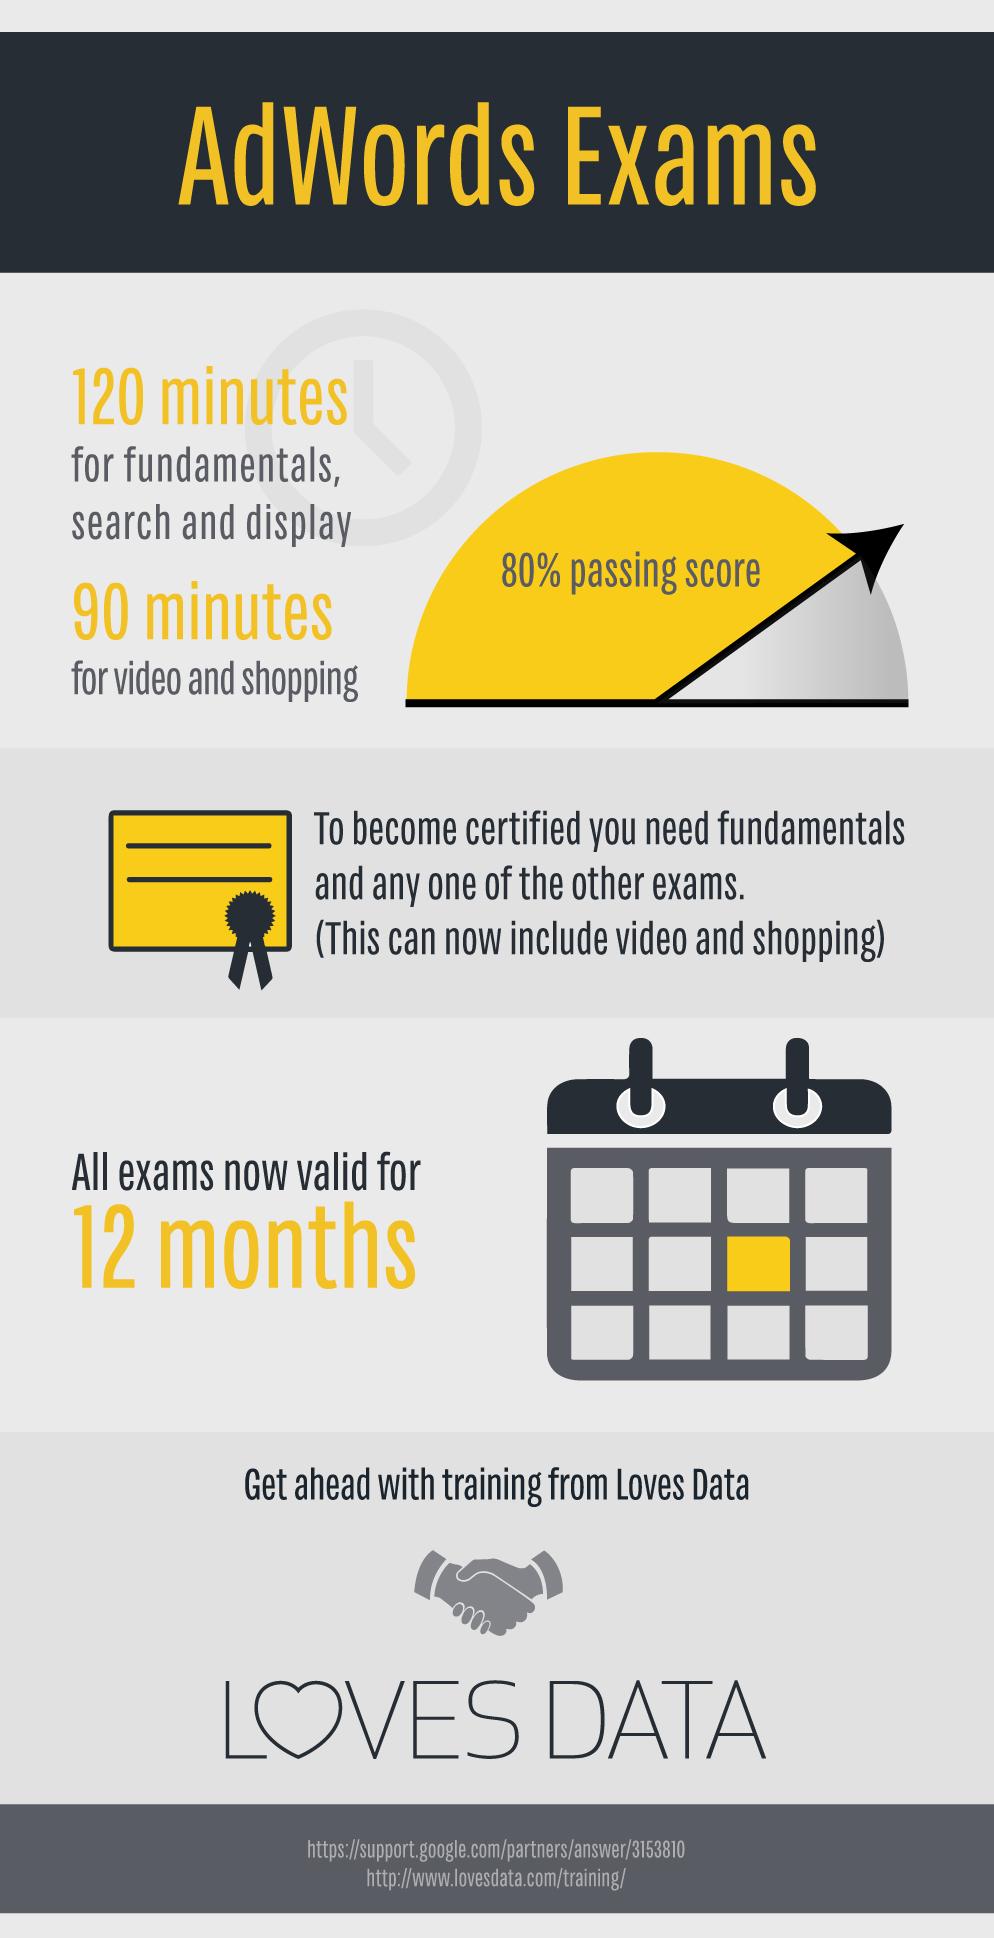 ADWORDS-EXAMS-infographic-lovesdatav2